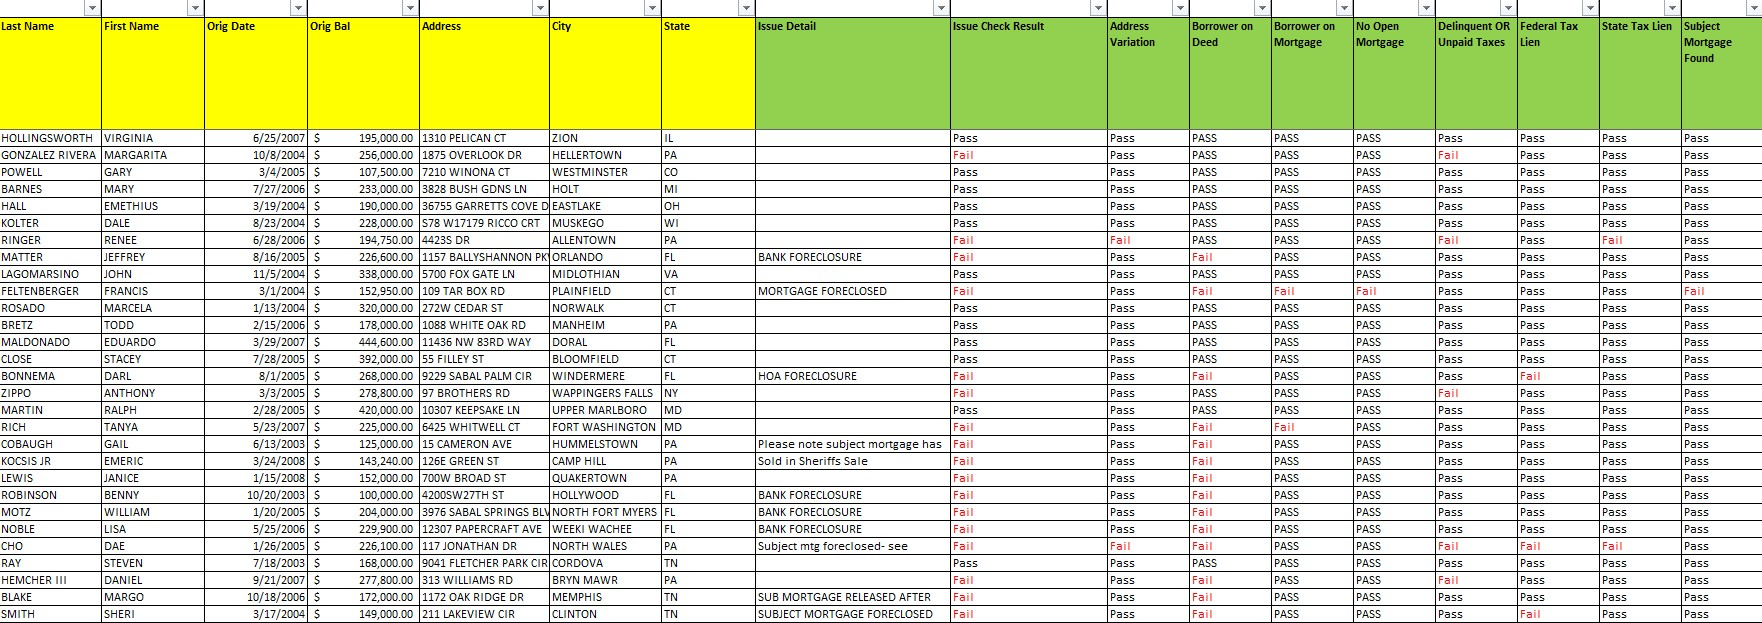 Mtg Spreadsheet Pertaining To Spreadsheet Analysis And Exam On Property Pool